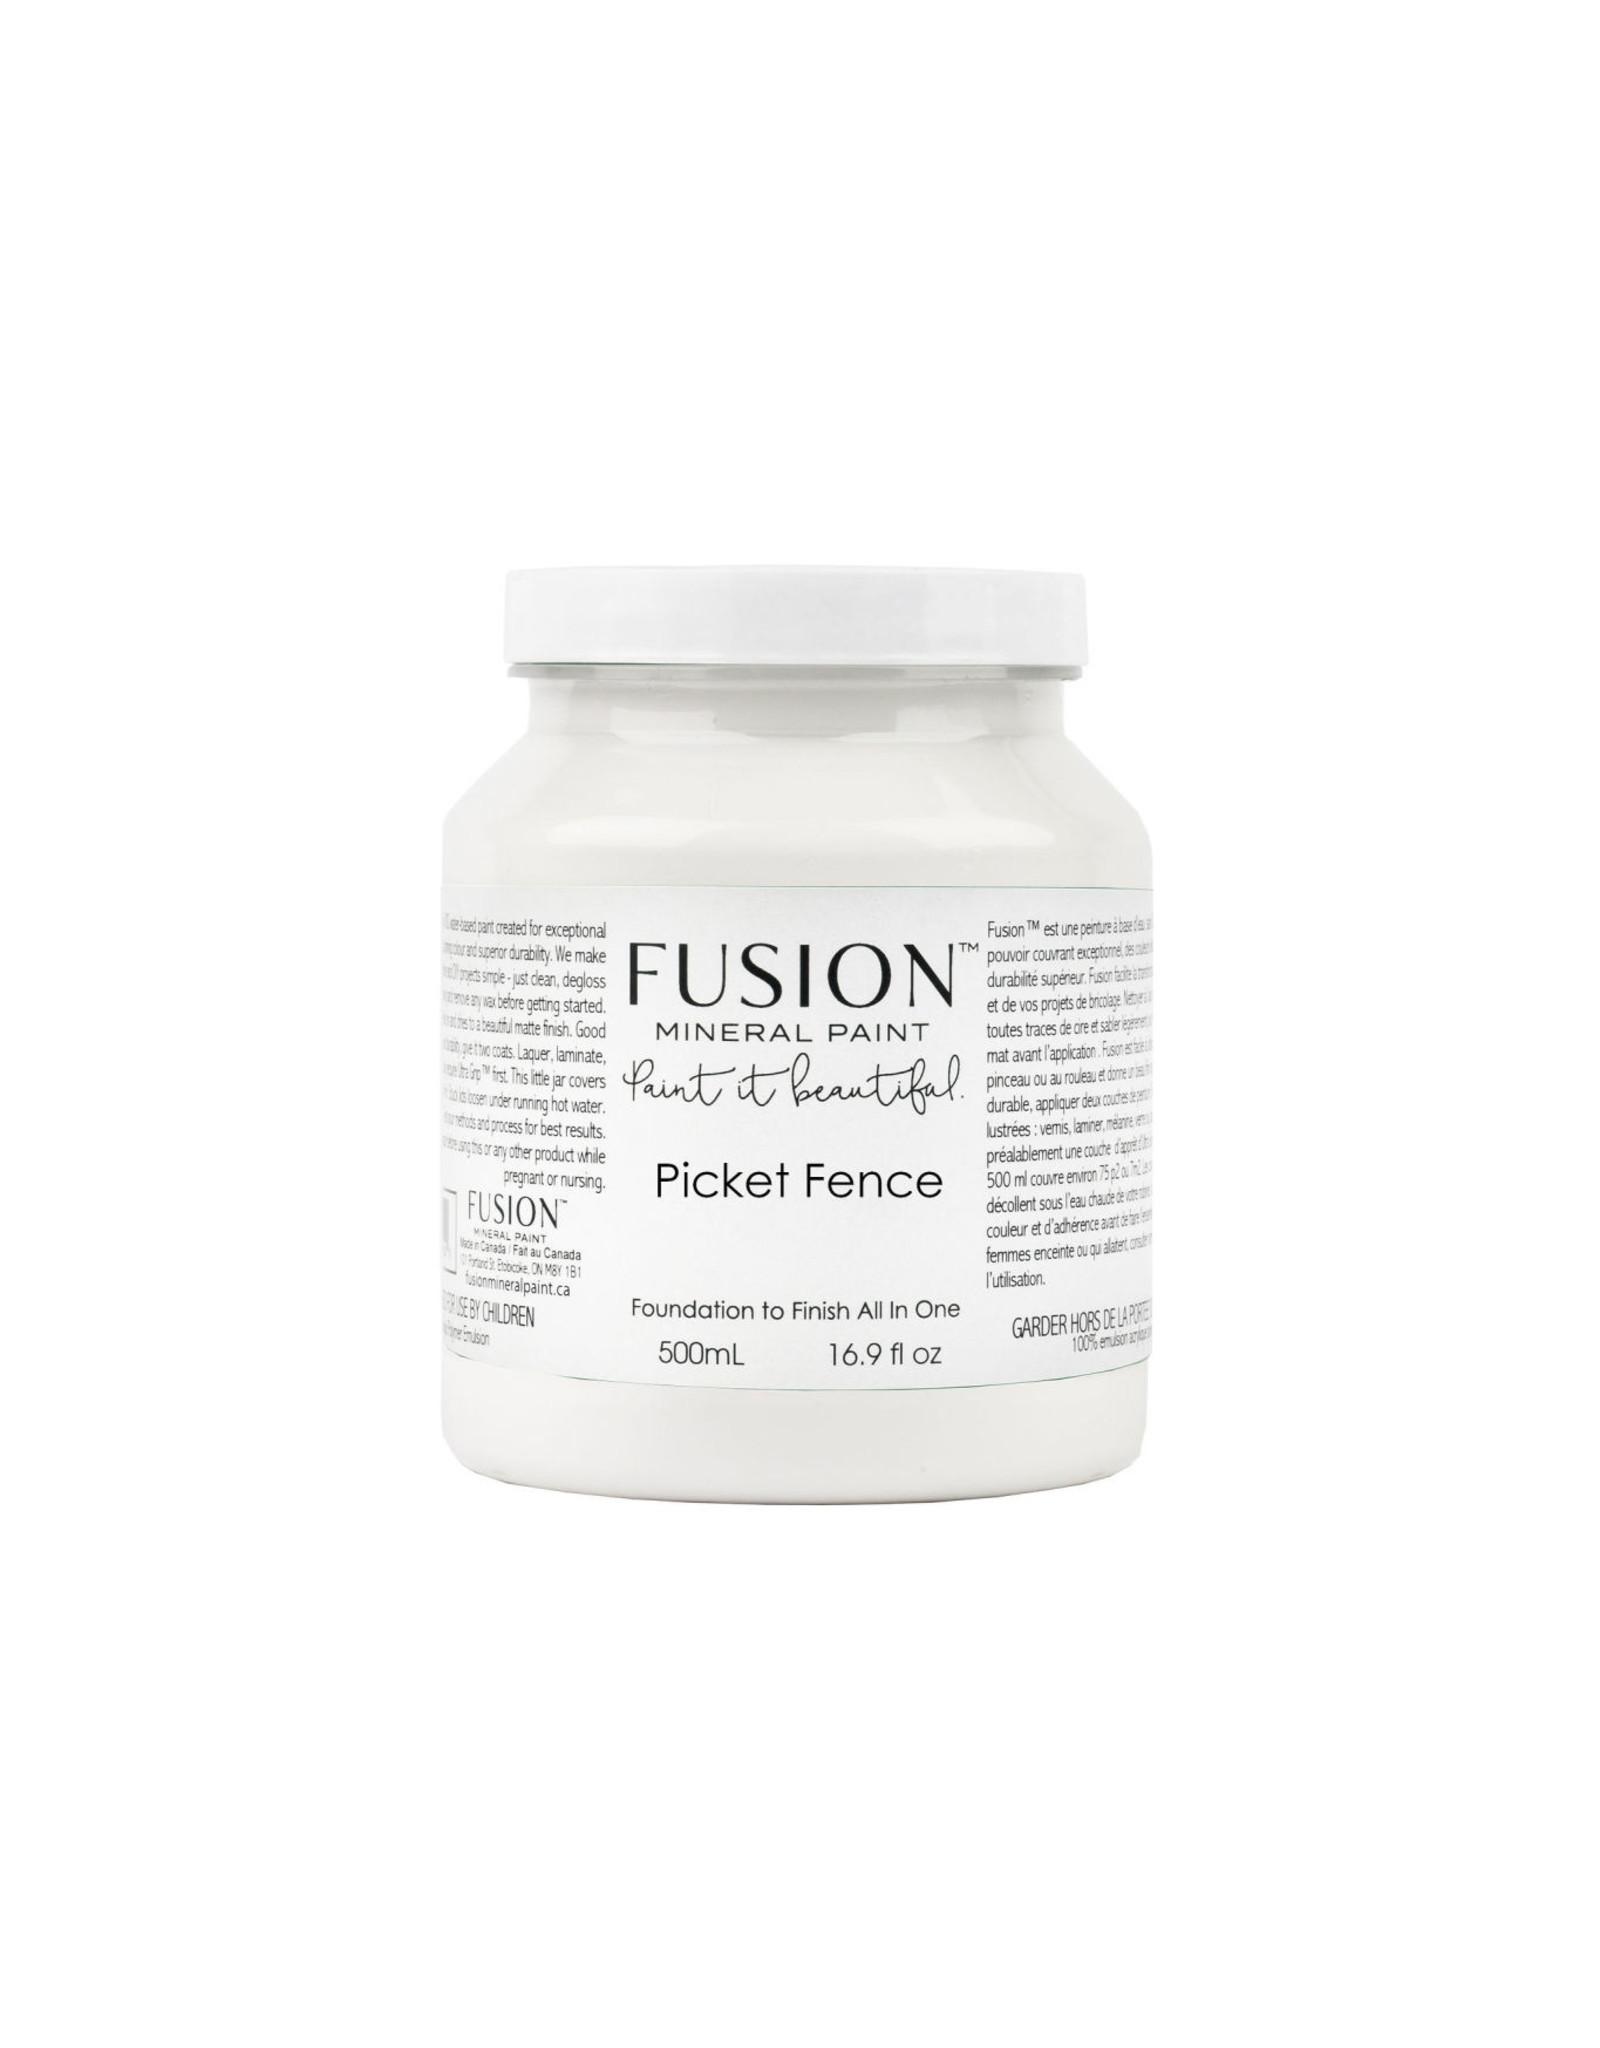 Fusion Mineral Paint Fusion Mineral Paint - Picket Fence 500ml